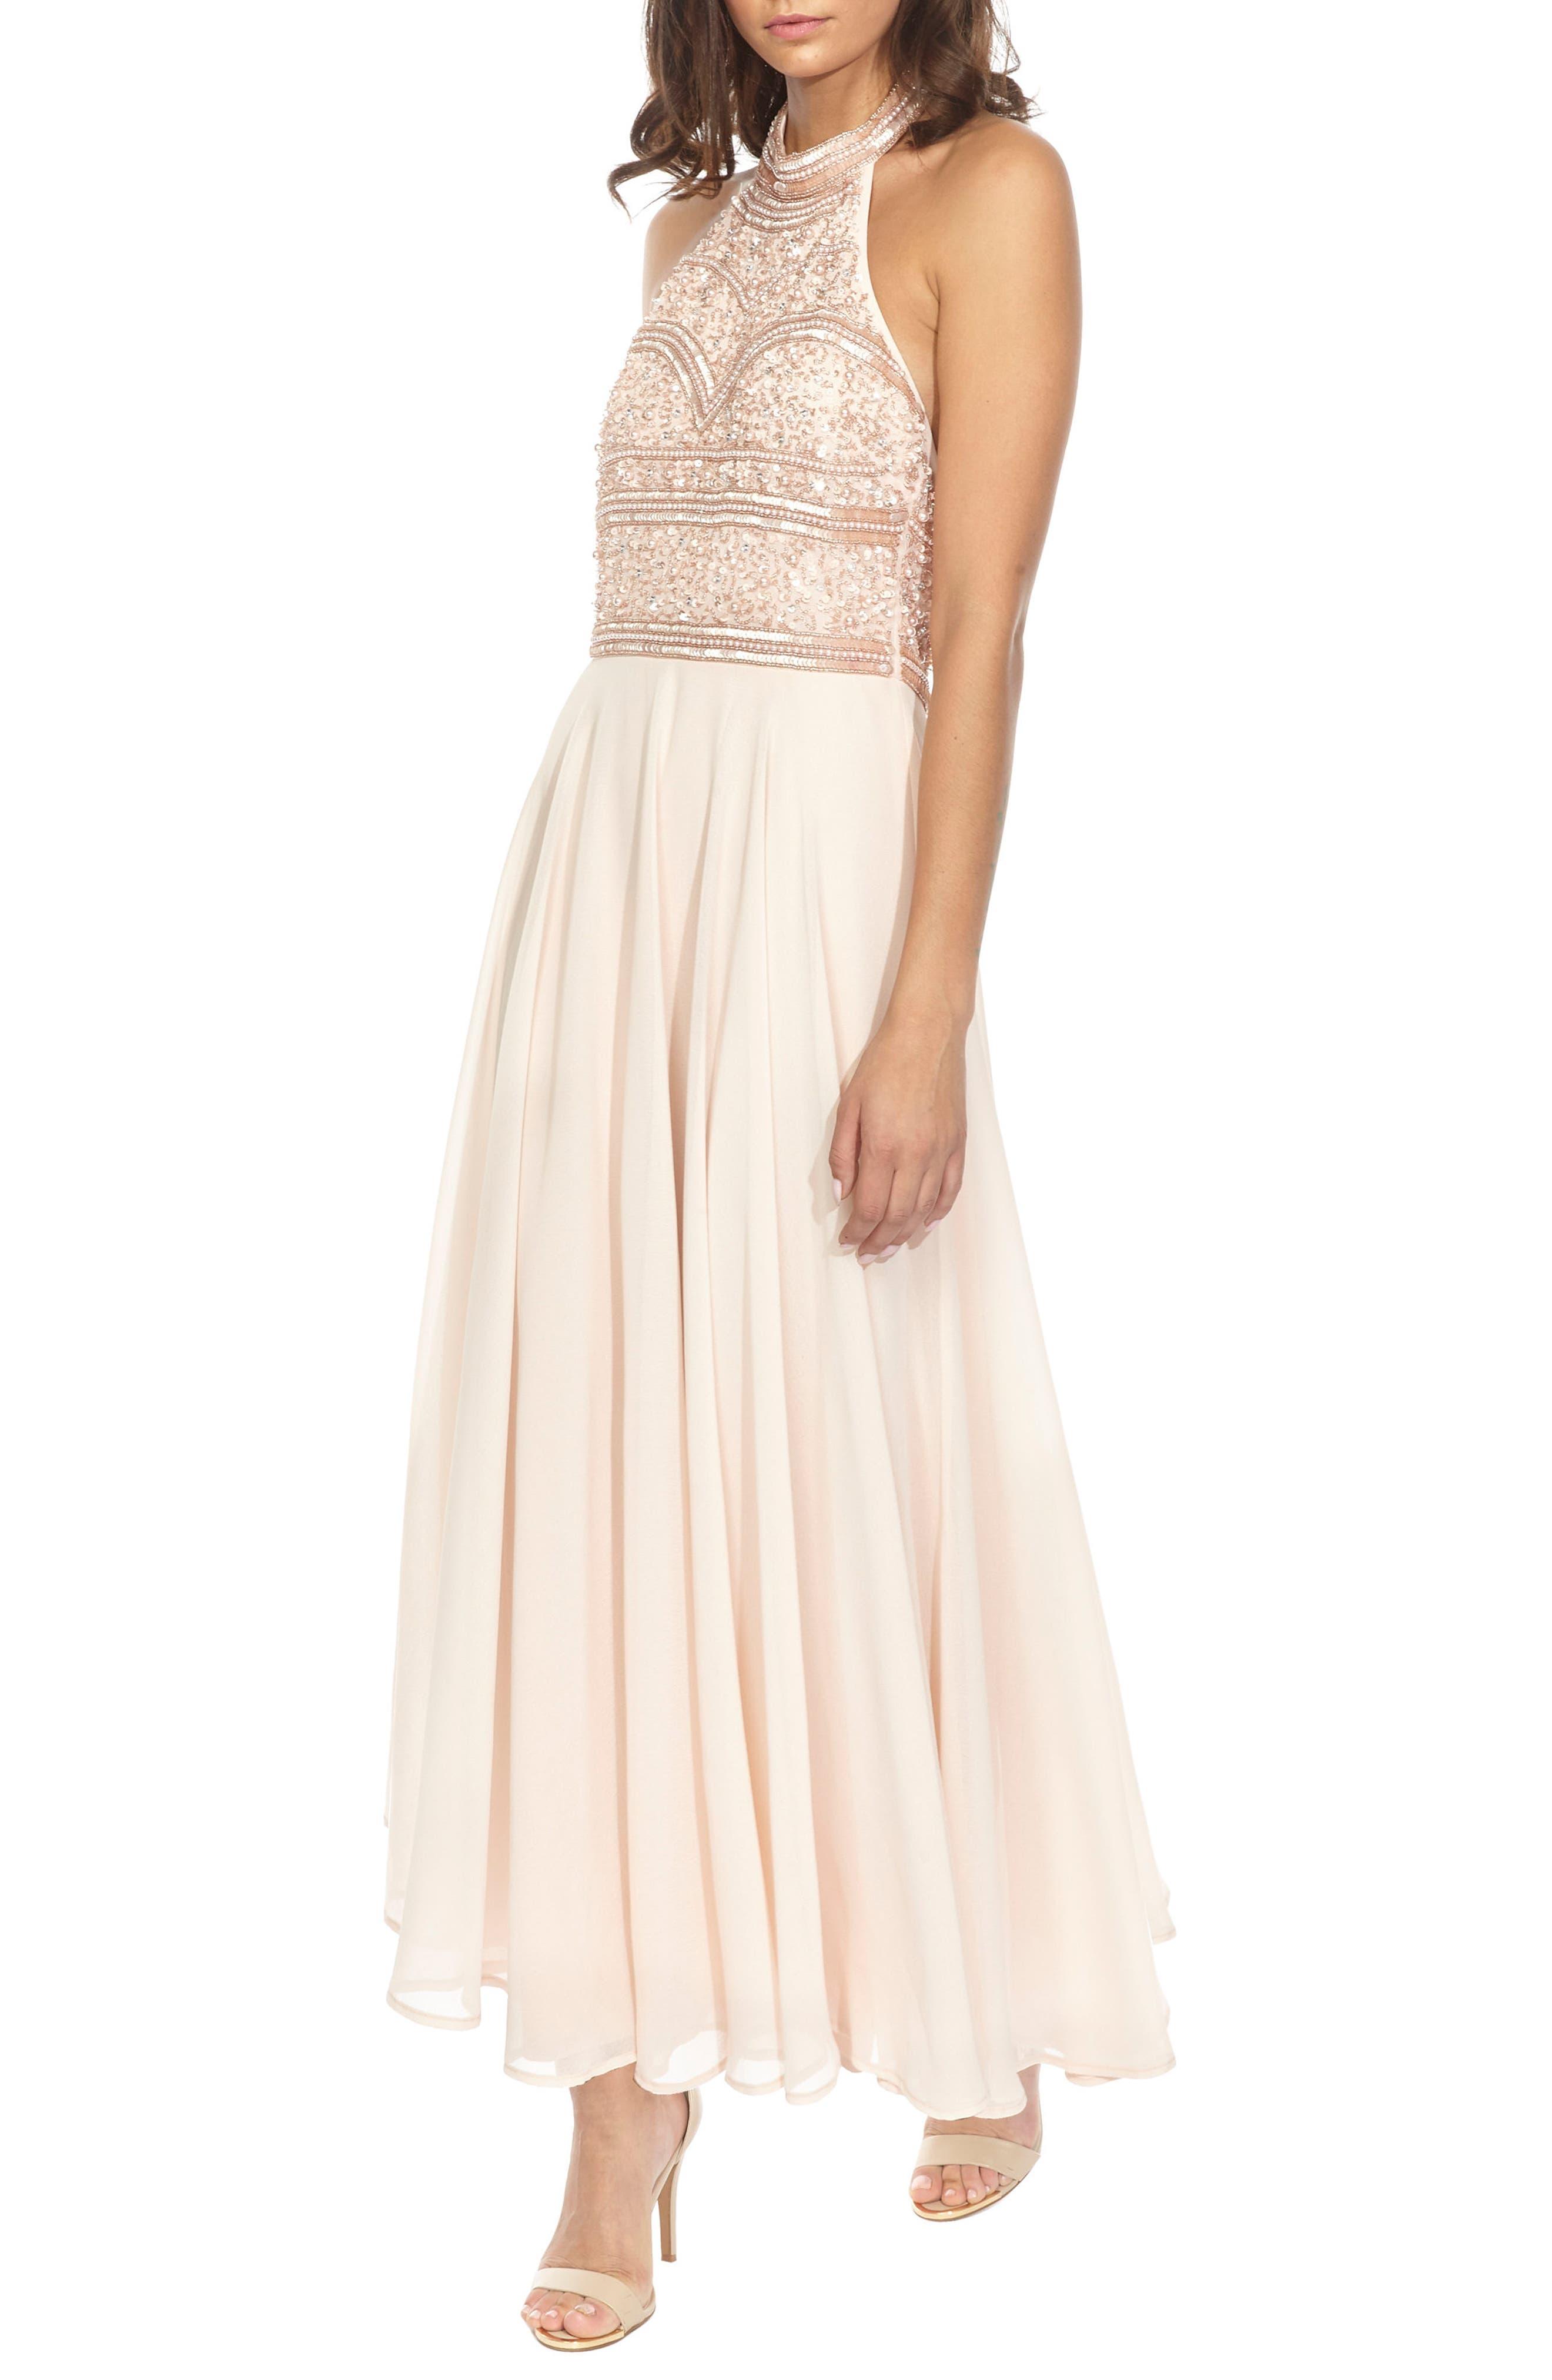 Sunrise Embellished Halter Maxi Dress,                             Alternate thumbnail 3, color,                             250